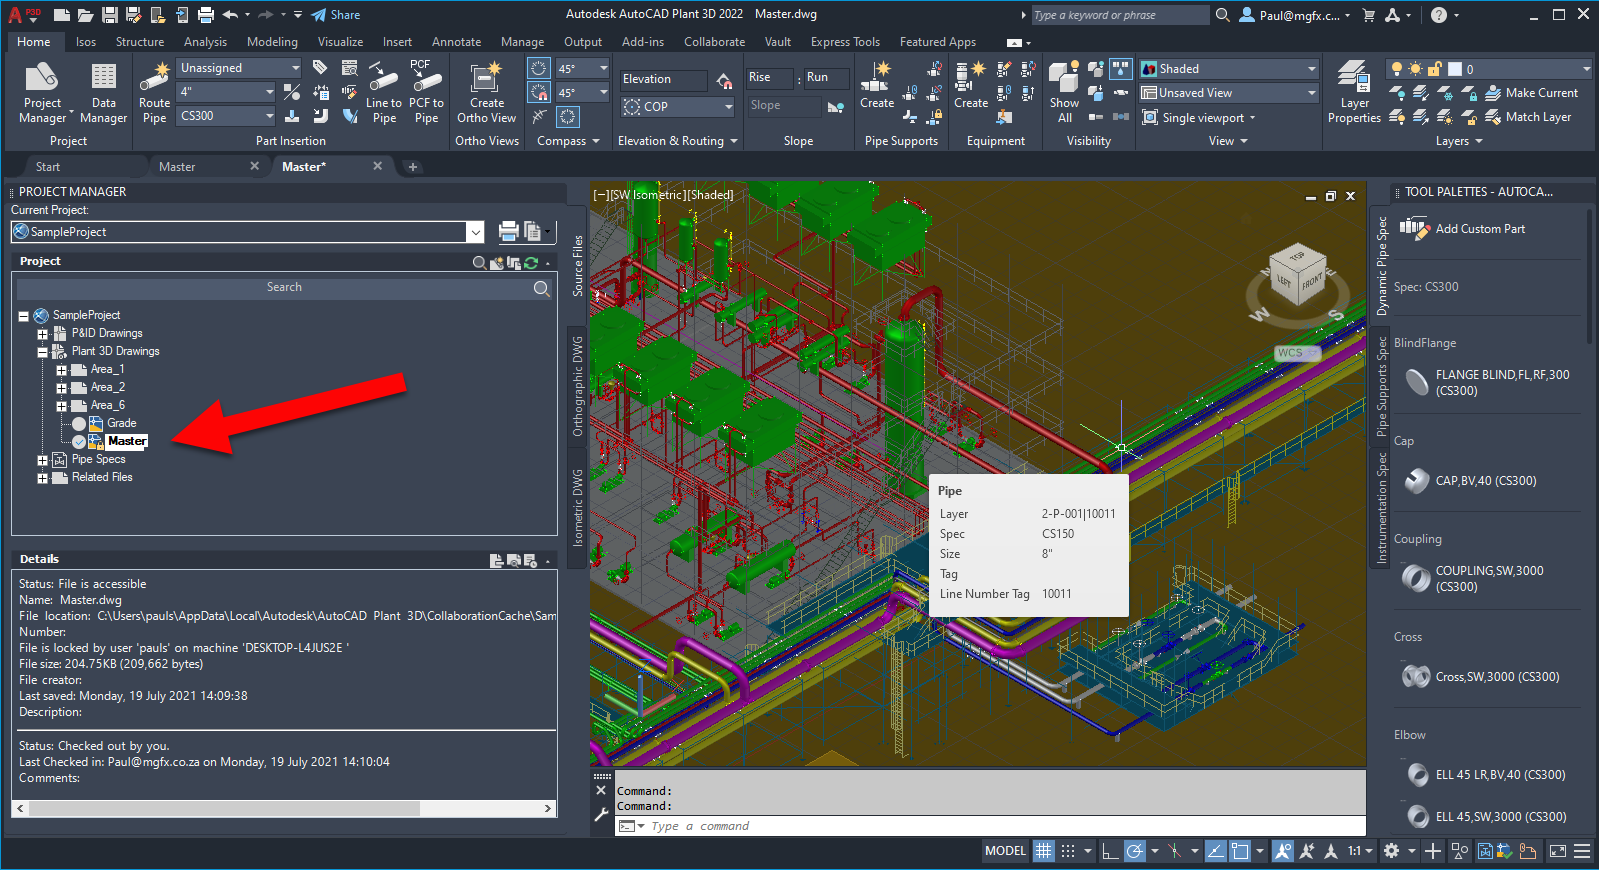 Autodesk, Micrographics, Plant 3D, Navisworks 2022, Uniclass, Take-off